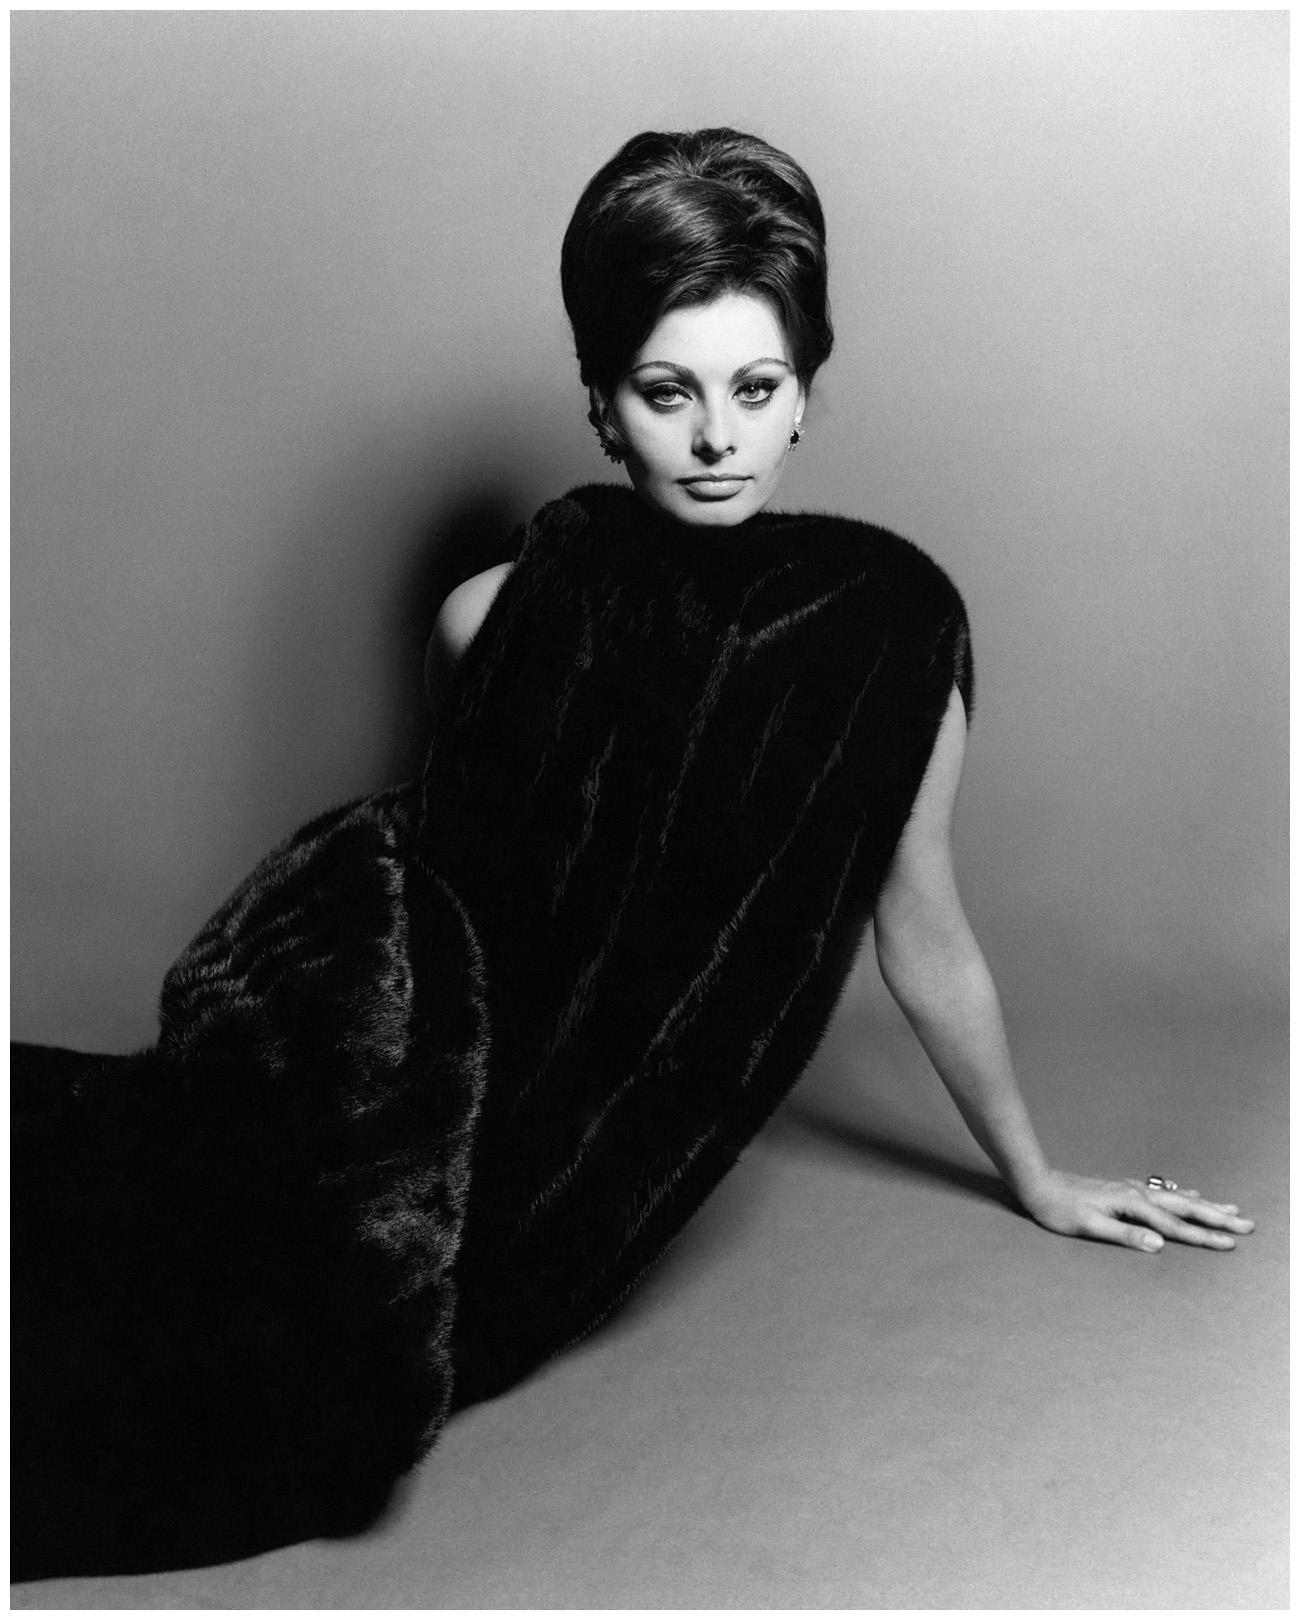 sophia-loren-photo-bert-stern-october-1963.jpg